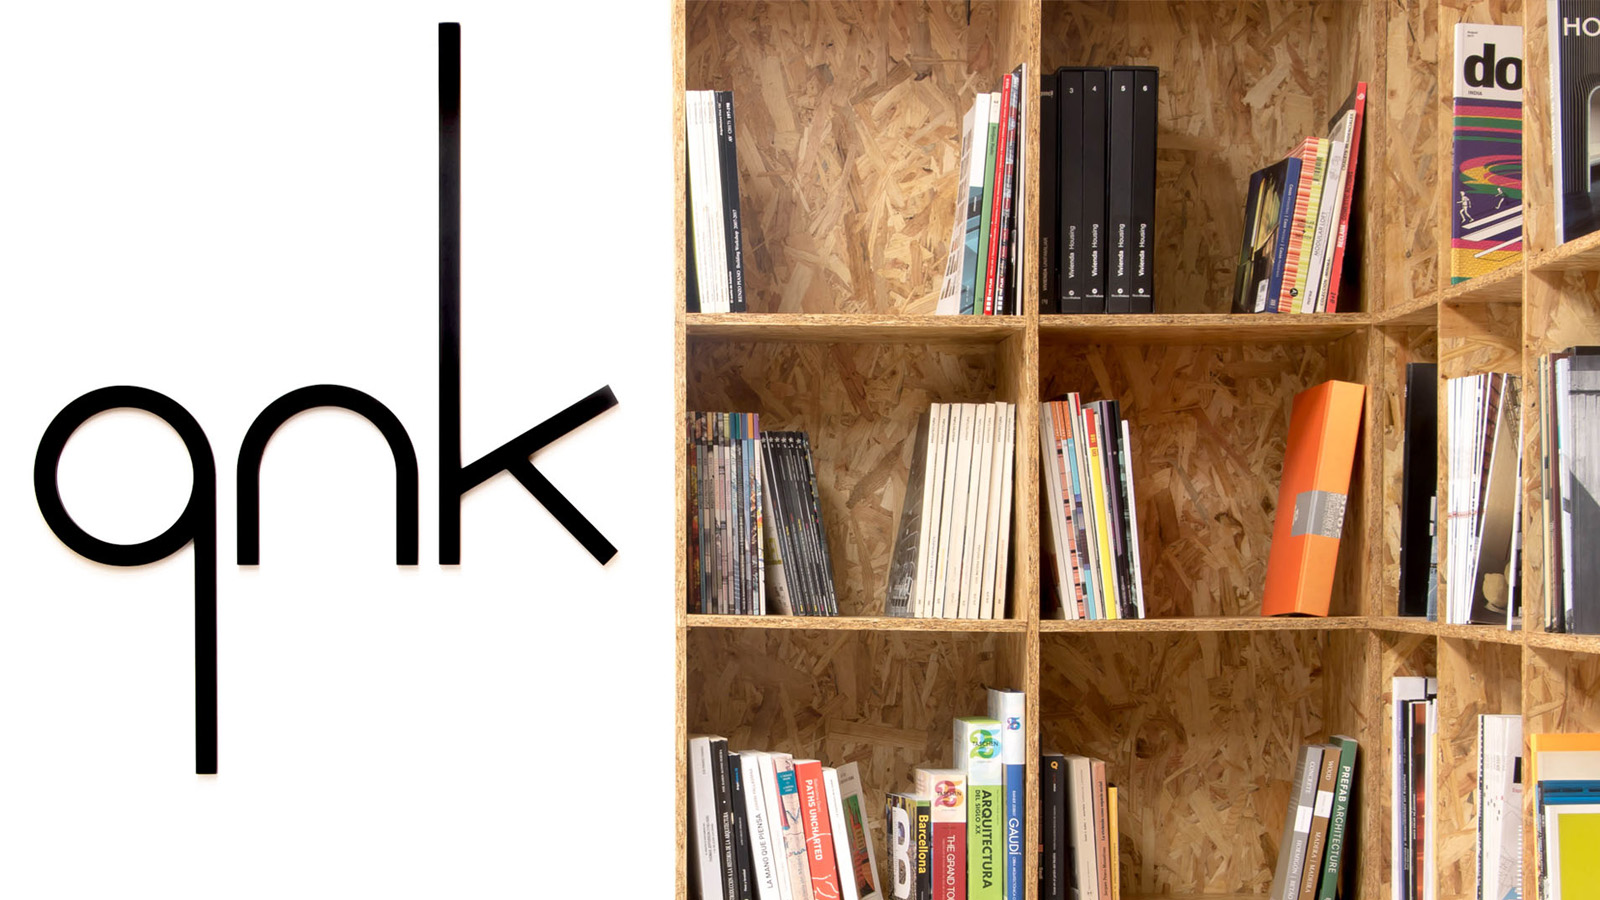 Estudio qnk. Detalle librería